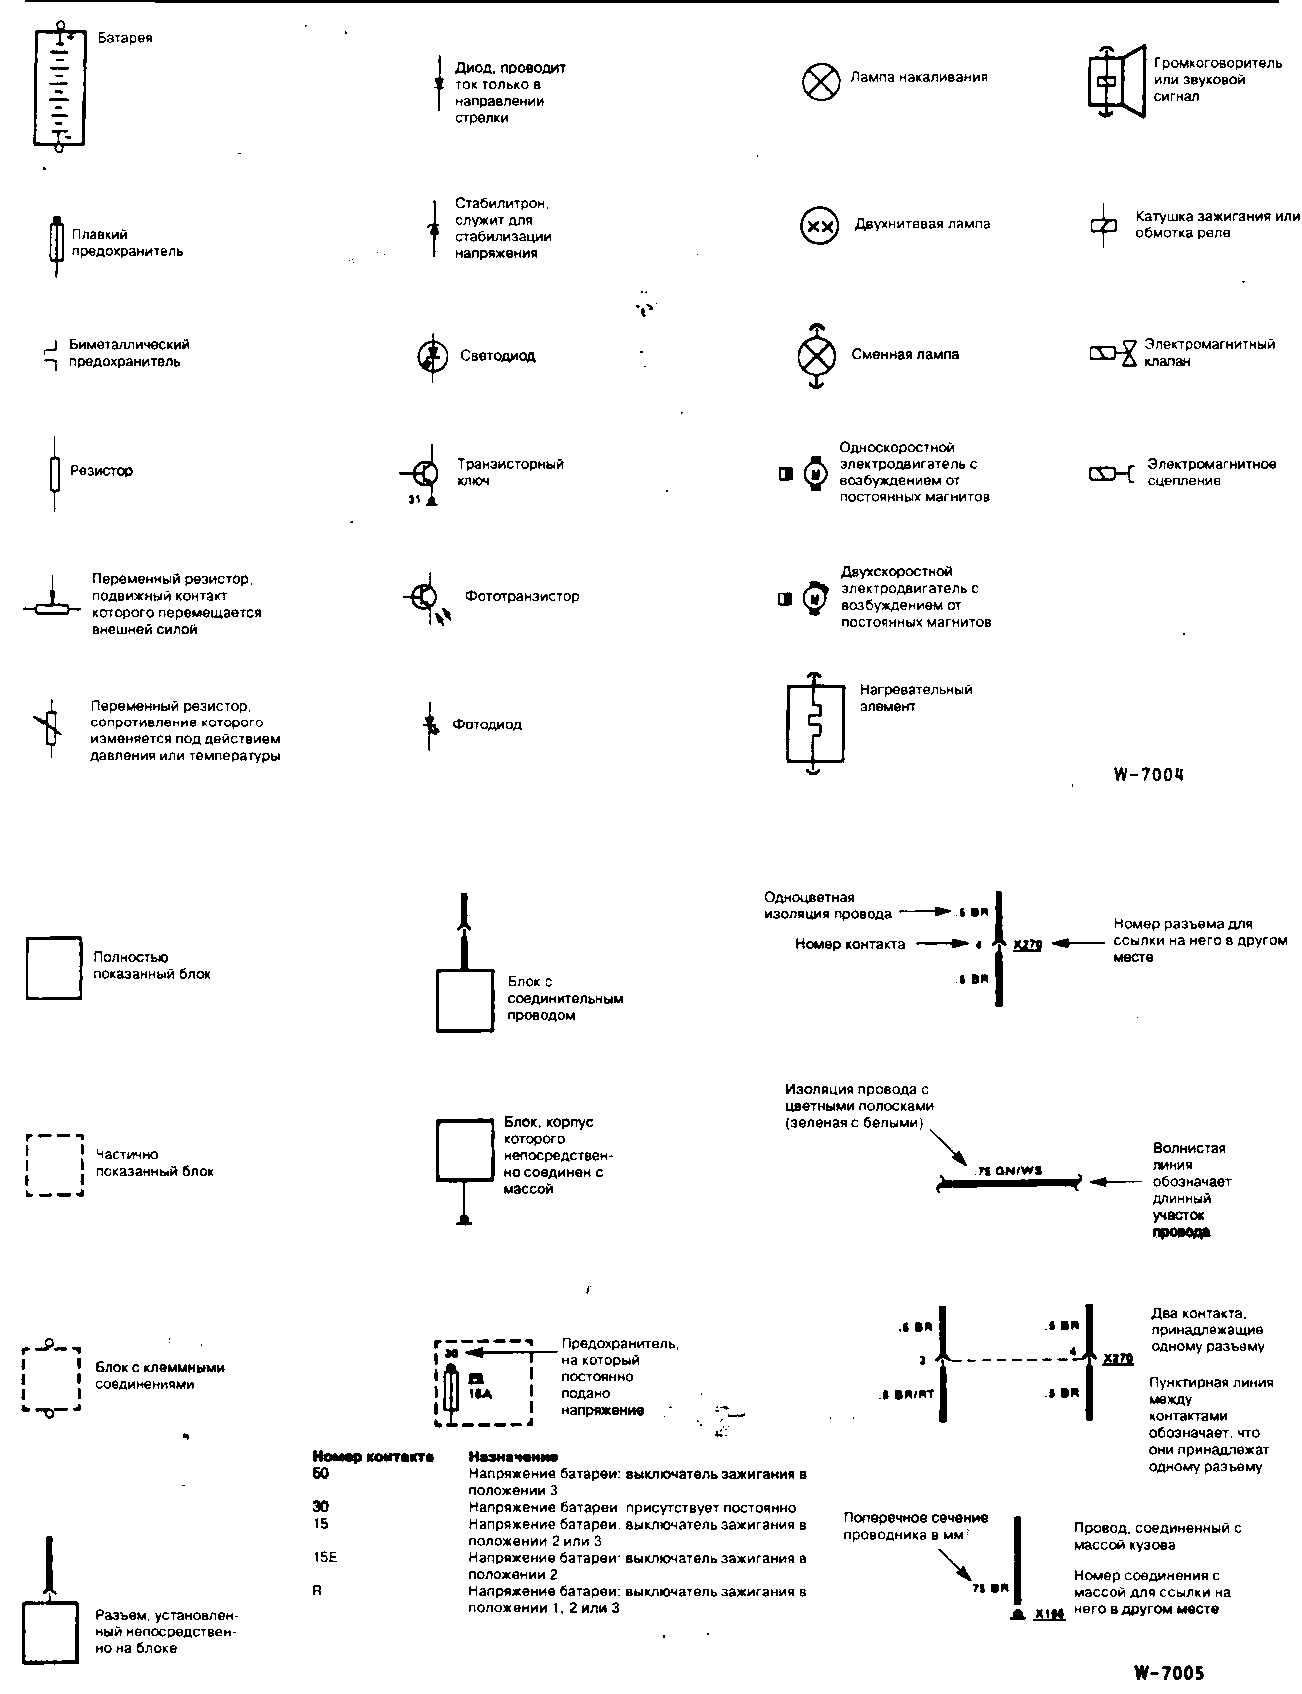 Cm обозначение на схеме